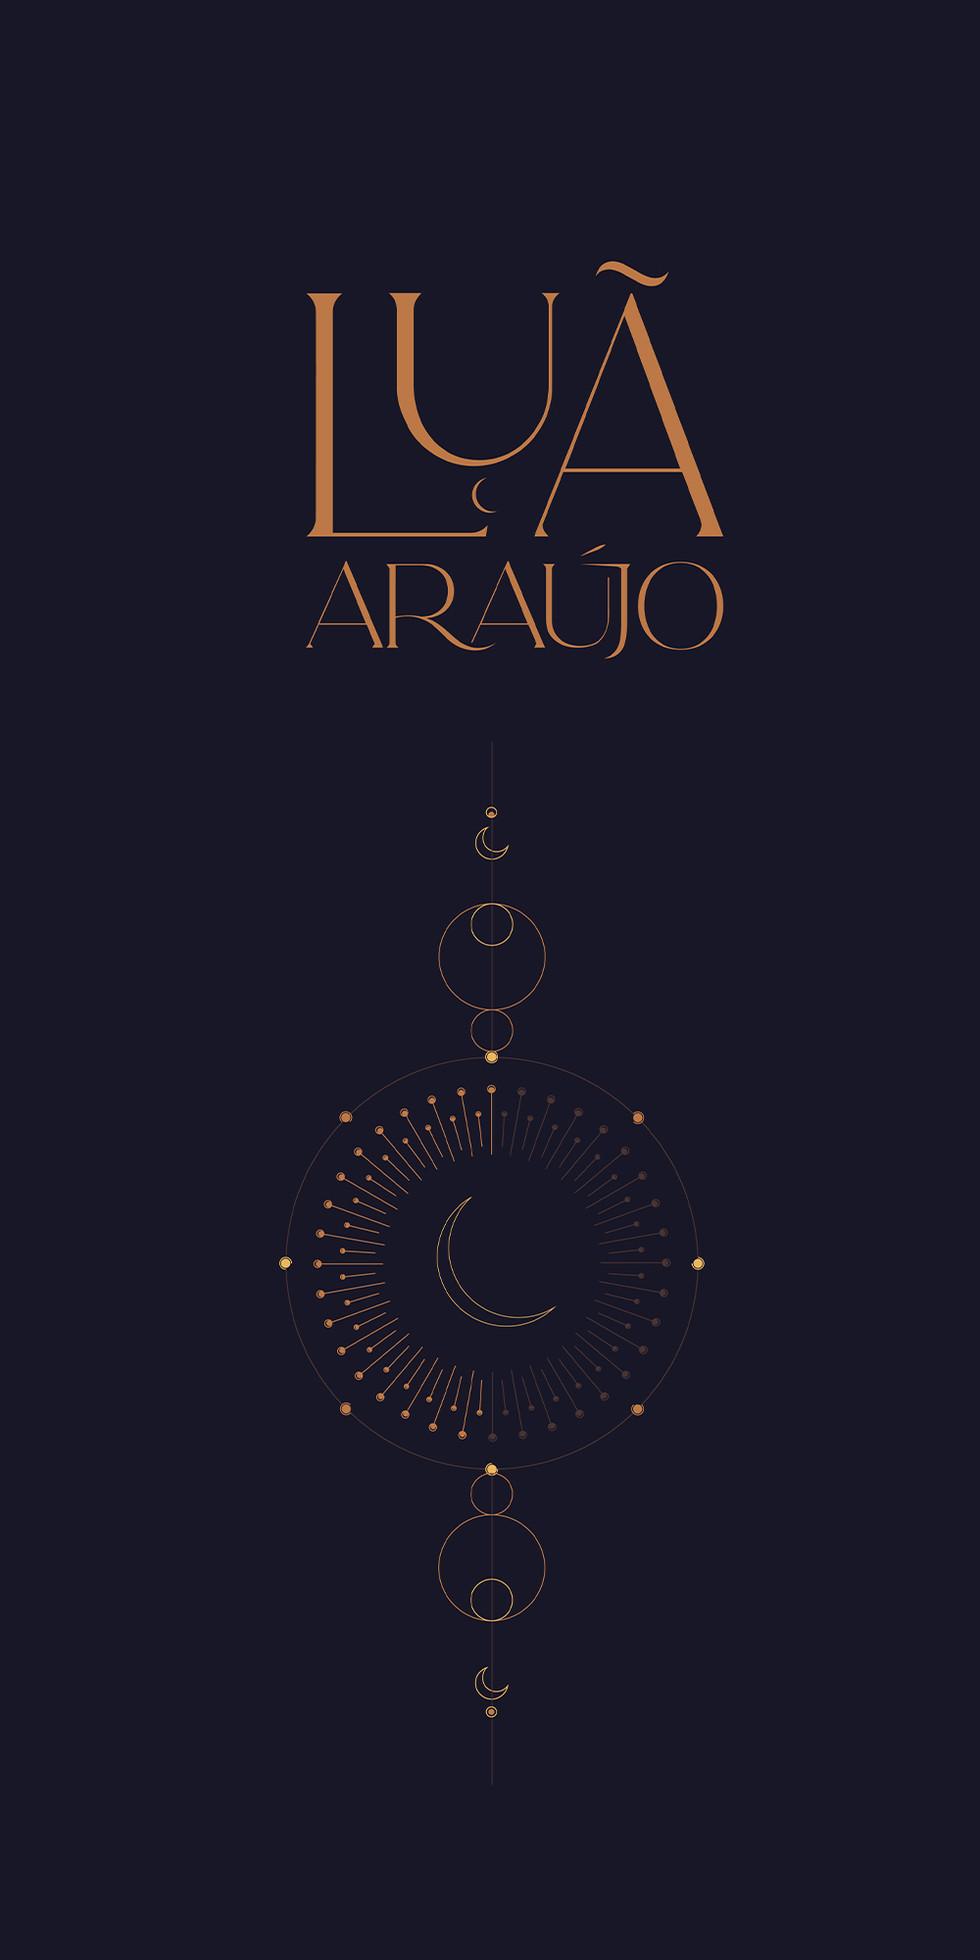 Diseño logo Luã Araujo